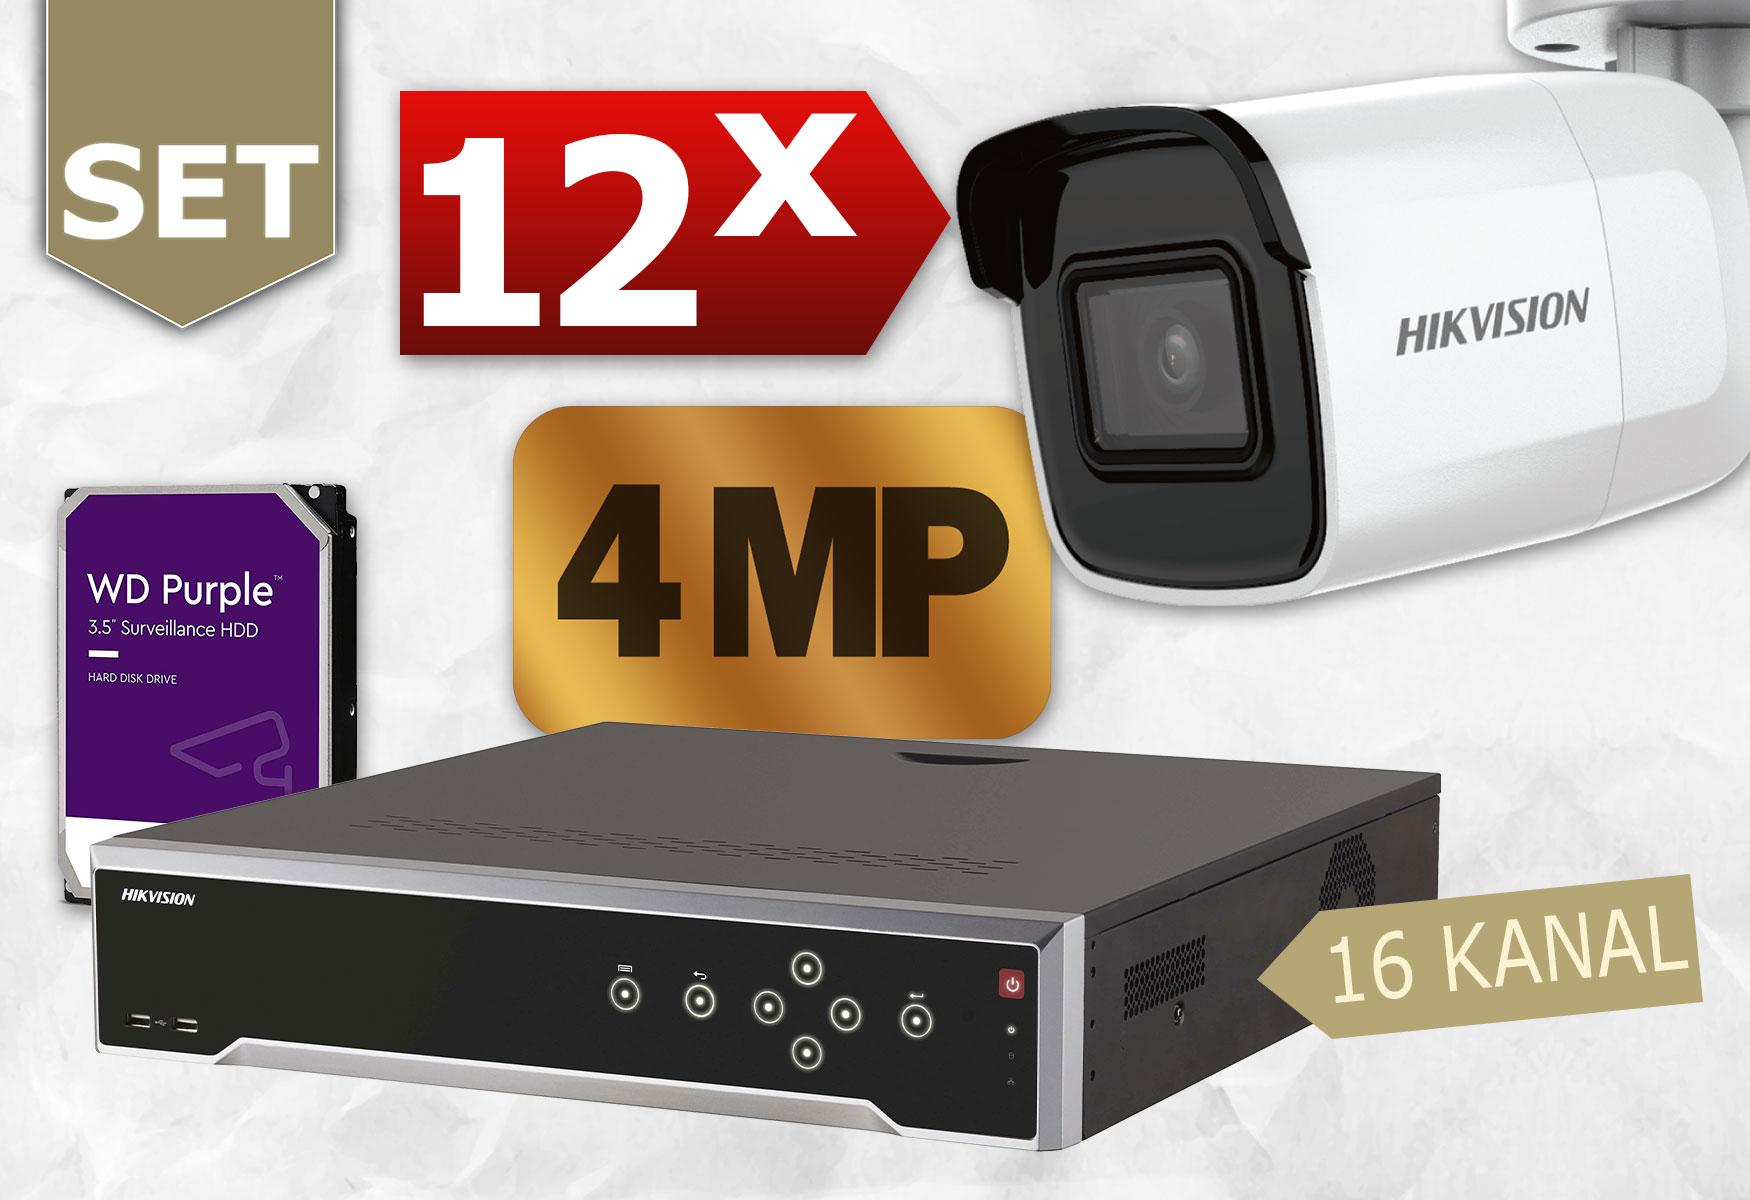 Bullet-12x-4MP-16-Kanal-Netzwerkgeraet-ueberwachungskamera_set_nvr_ip_kamera-GekkoStuff_2.jpg